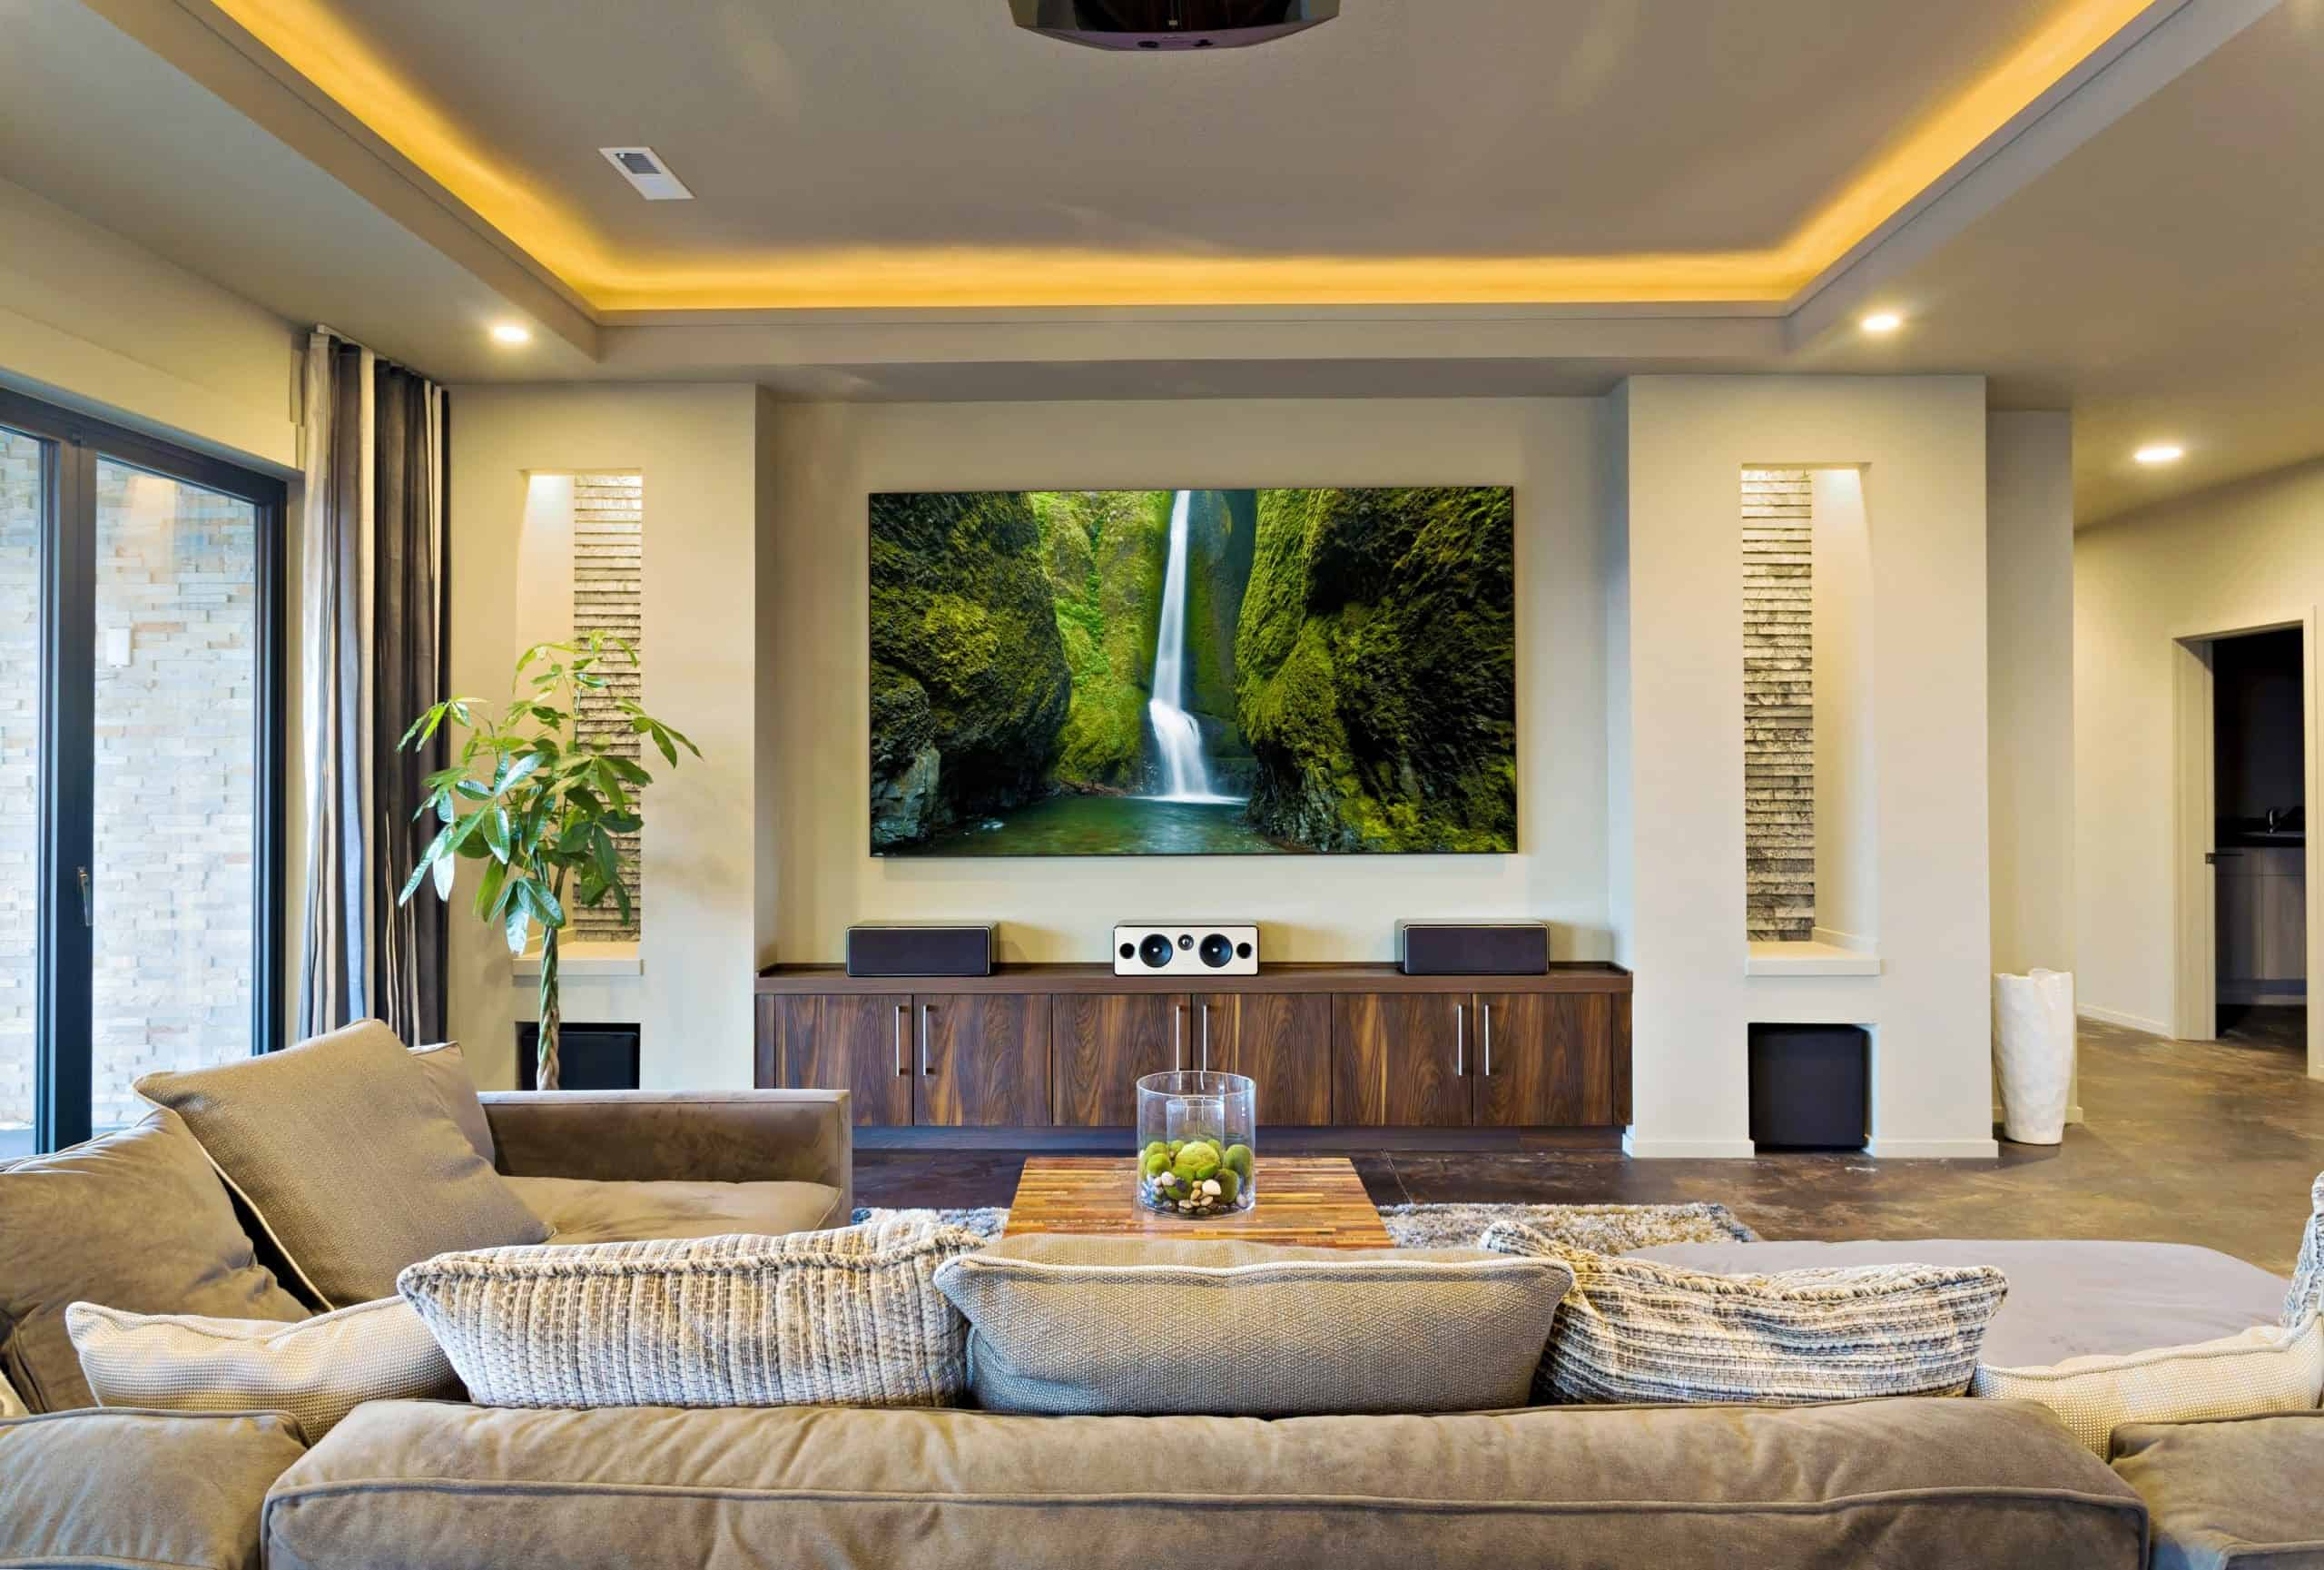 Custom Home Video and Audio